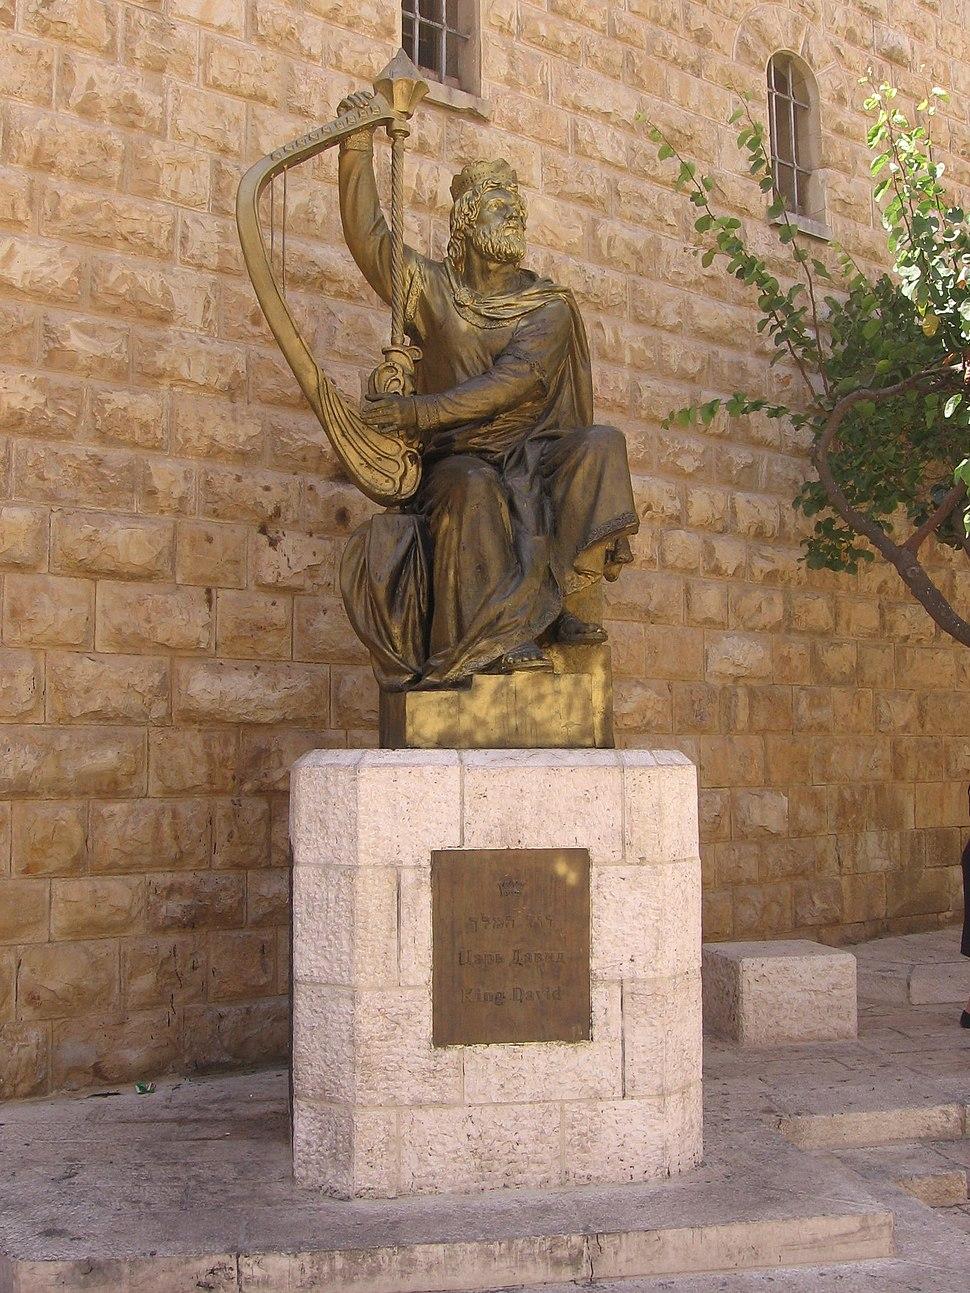 22.09.09 Jerusalem 086